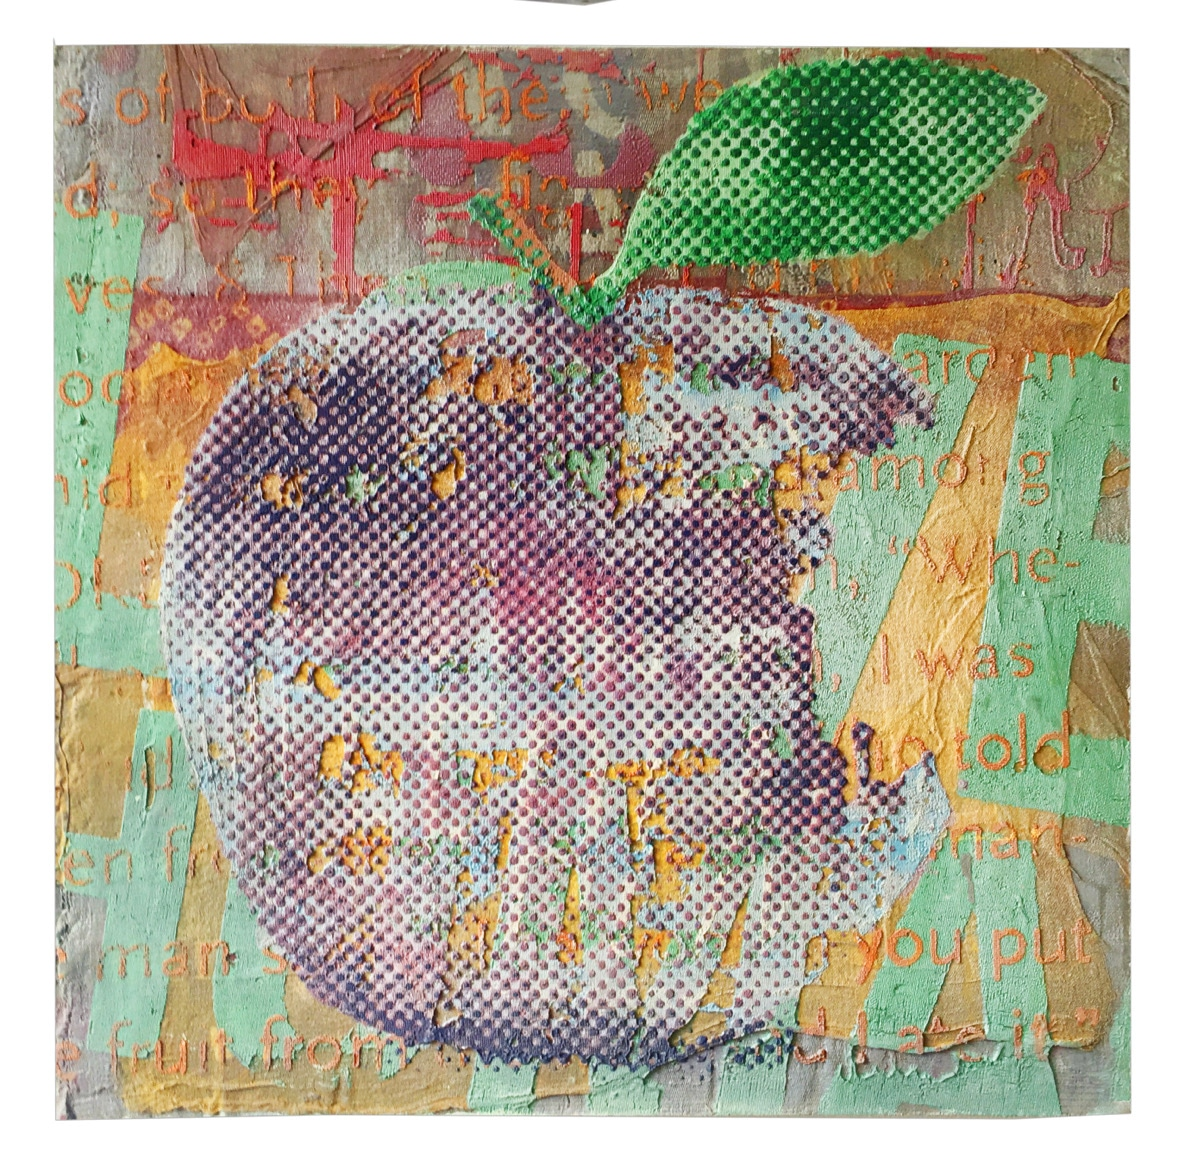 The violett forbidden fruit – apple   2019, 50x50cm